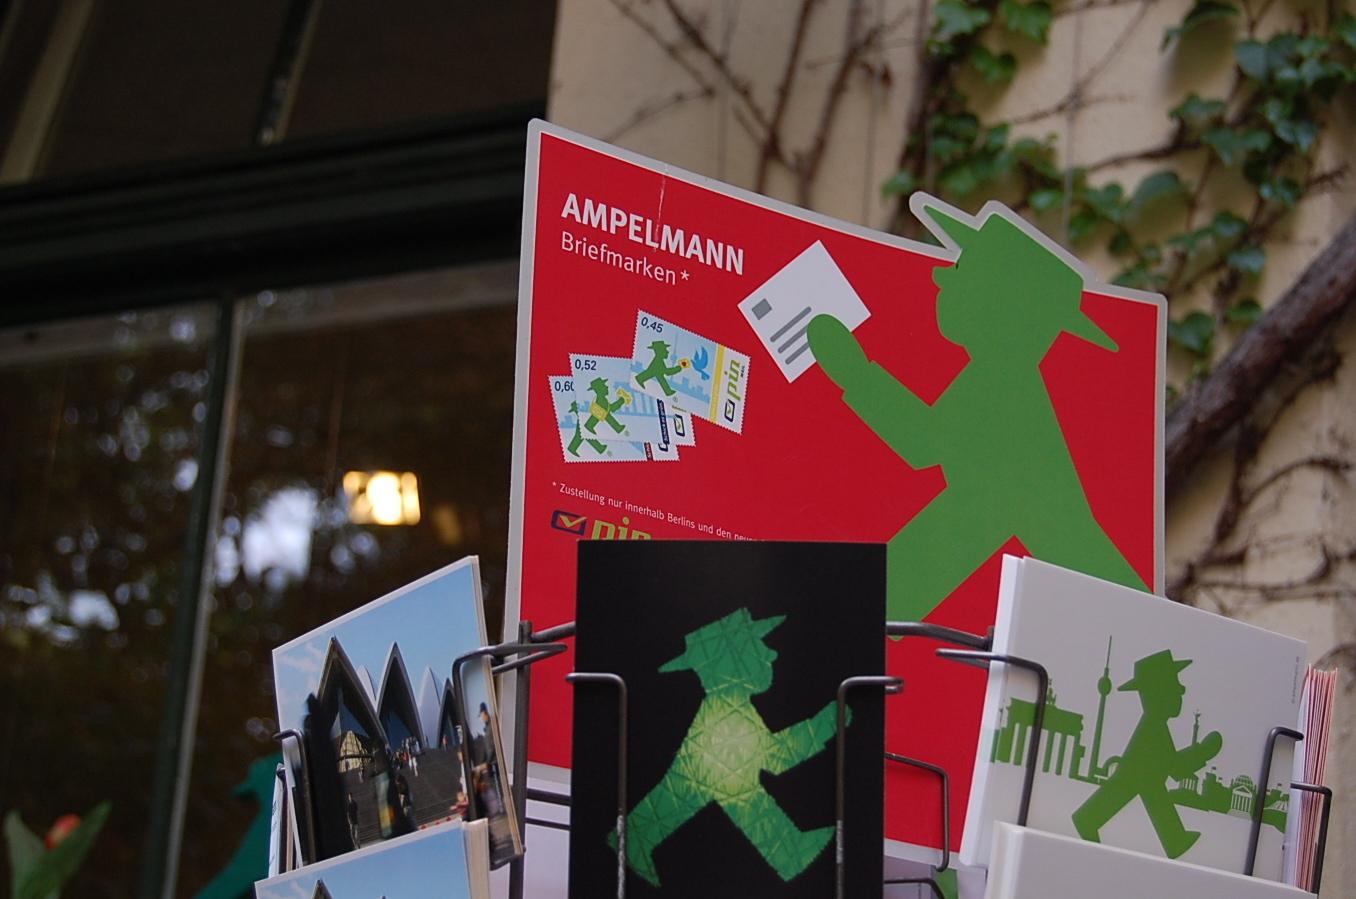 AMPELMANN Shop&Restaurant_c0180686_1628326.jpg